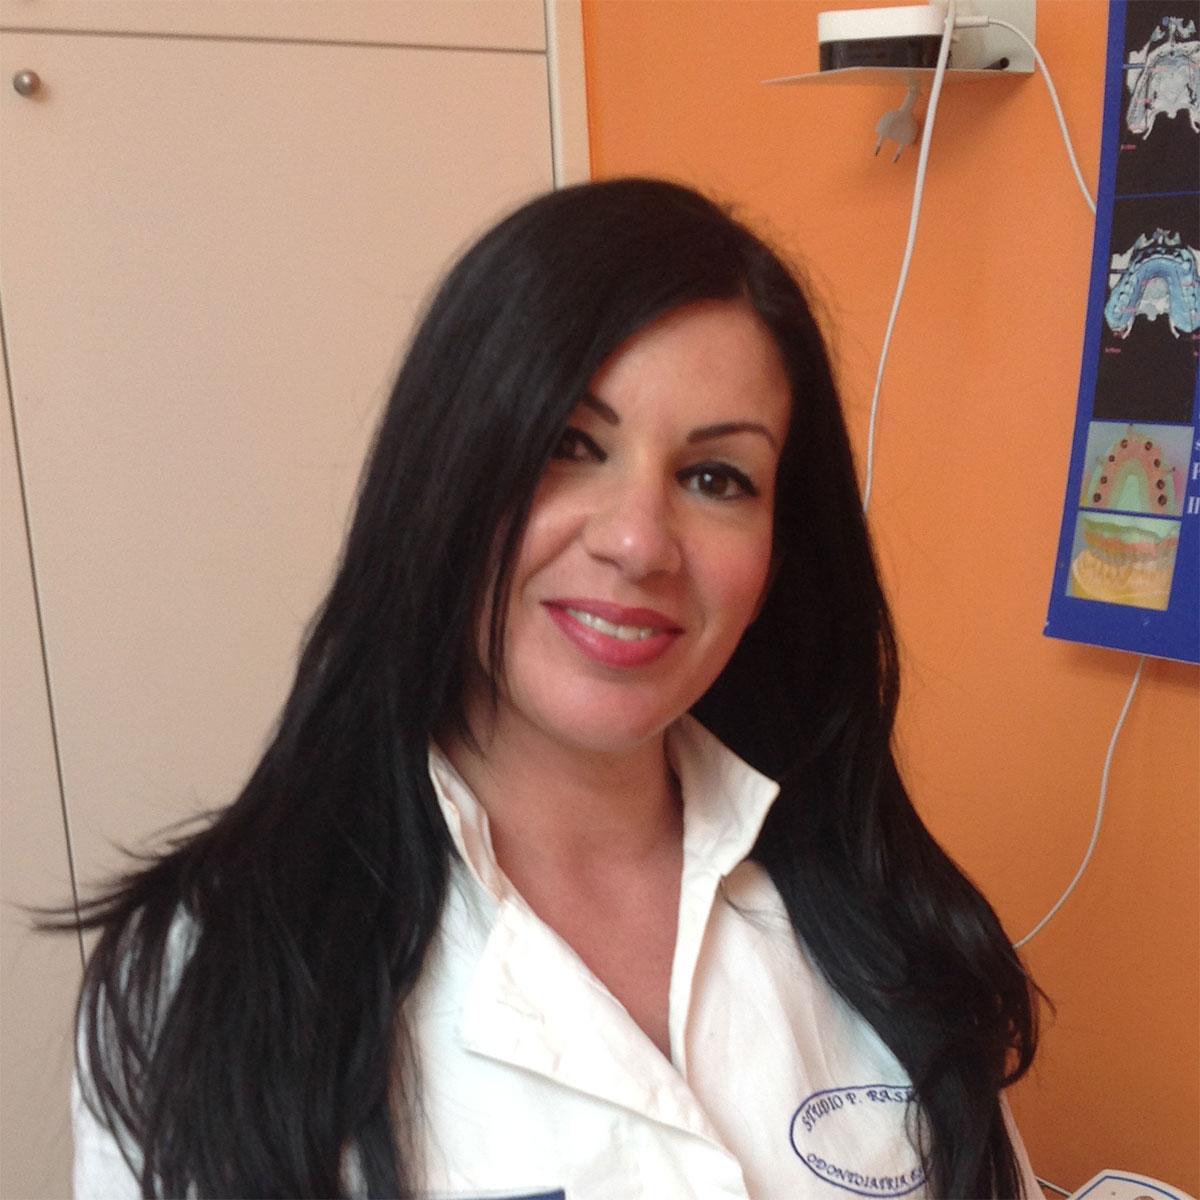 Sarah Porrazzo